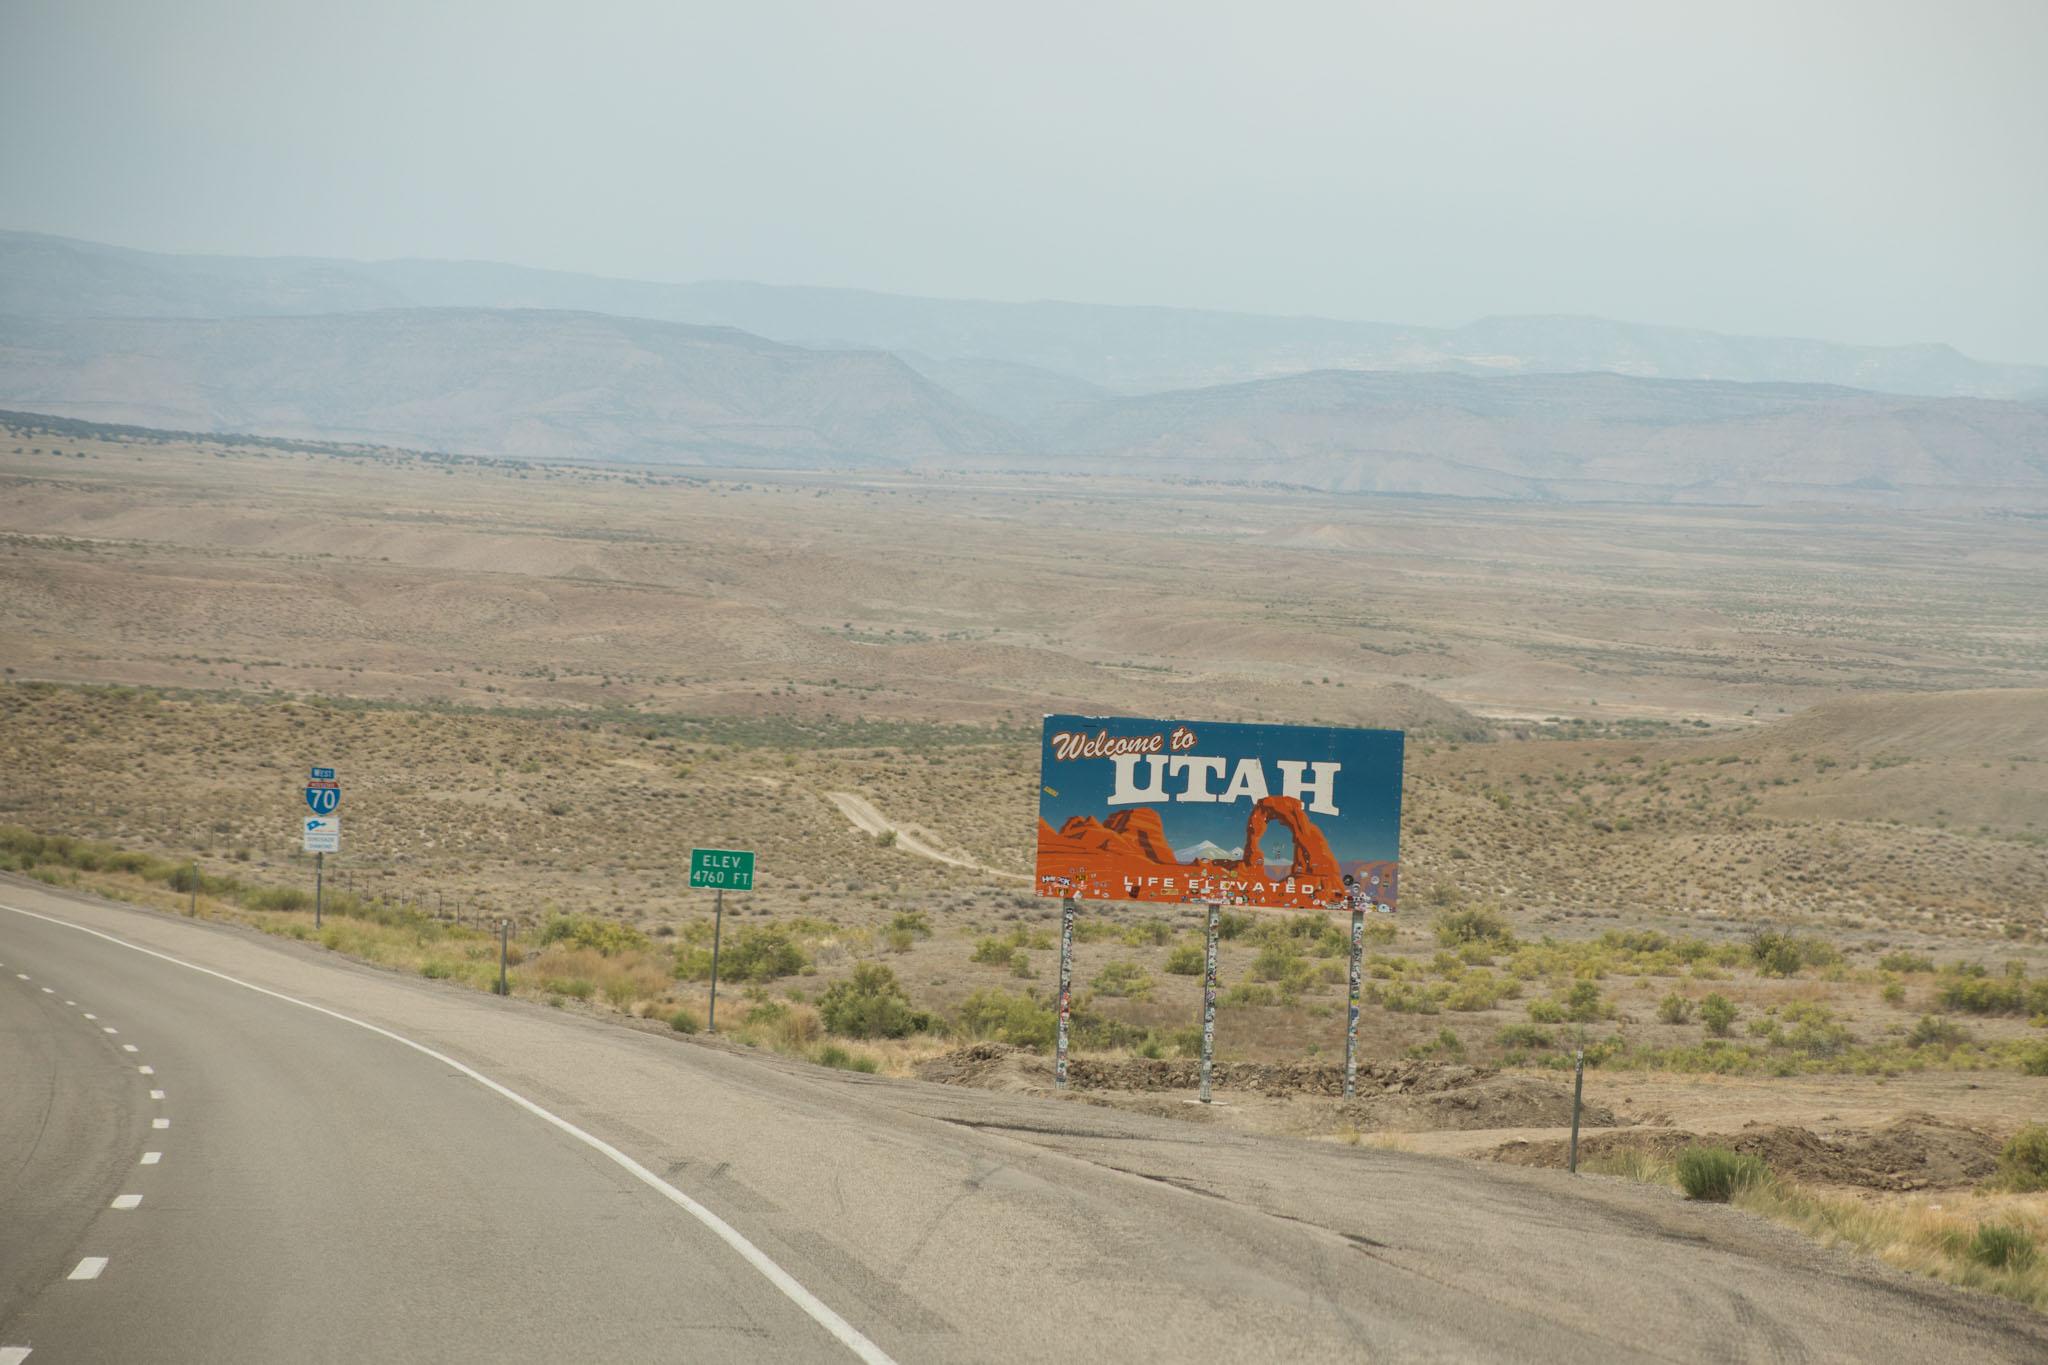 Utah Welcomes You